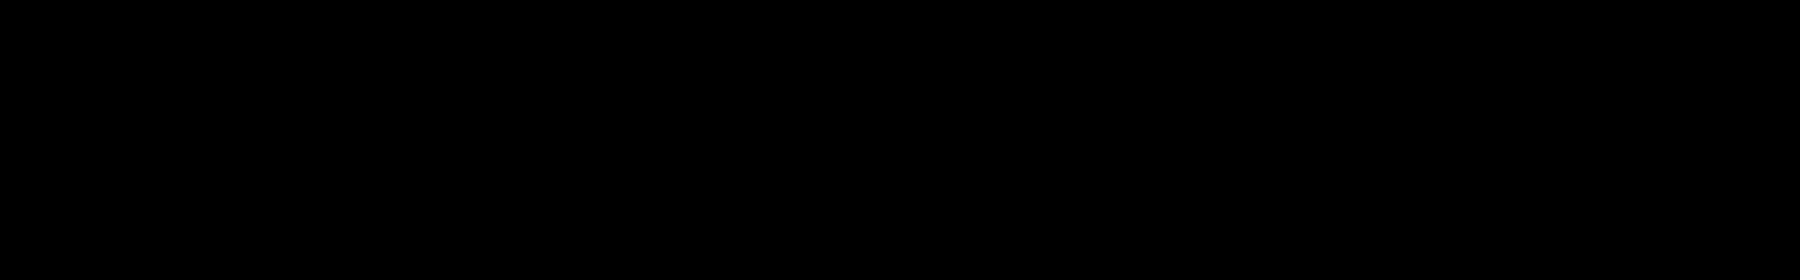 Mutahad audio waveform